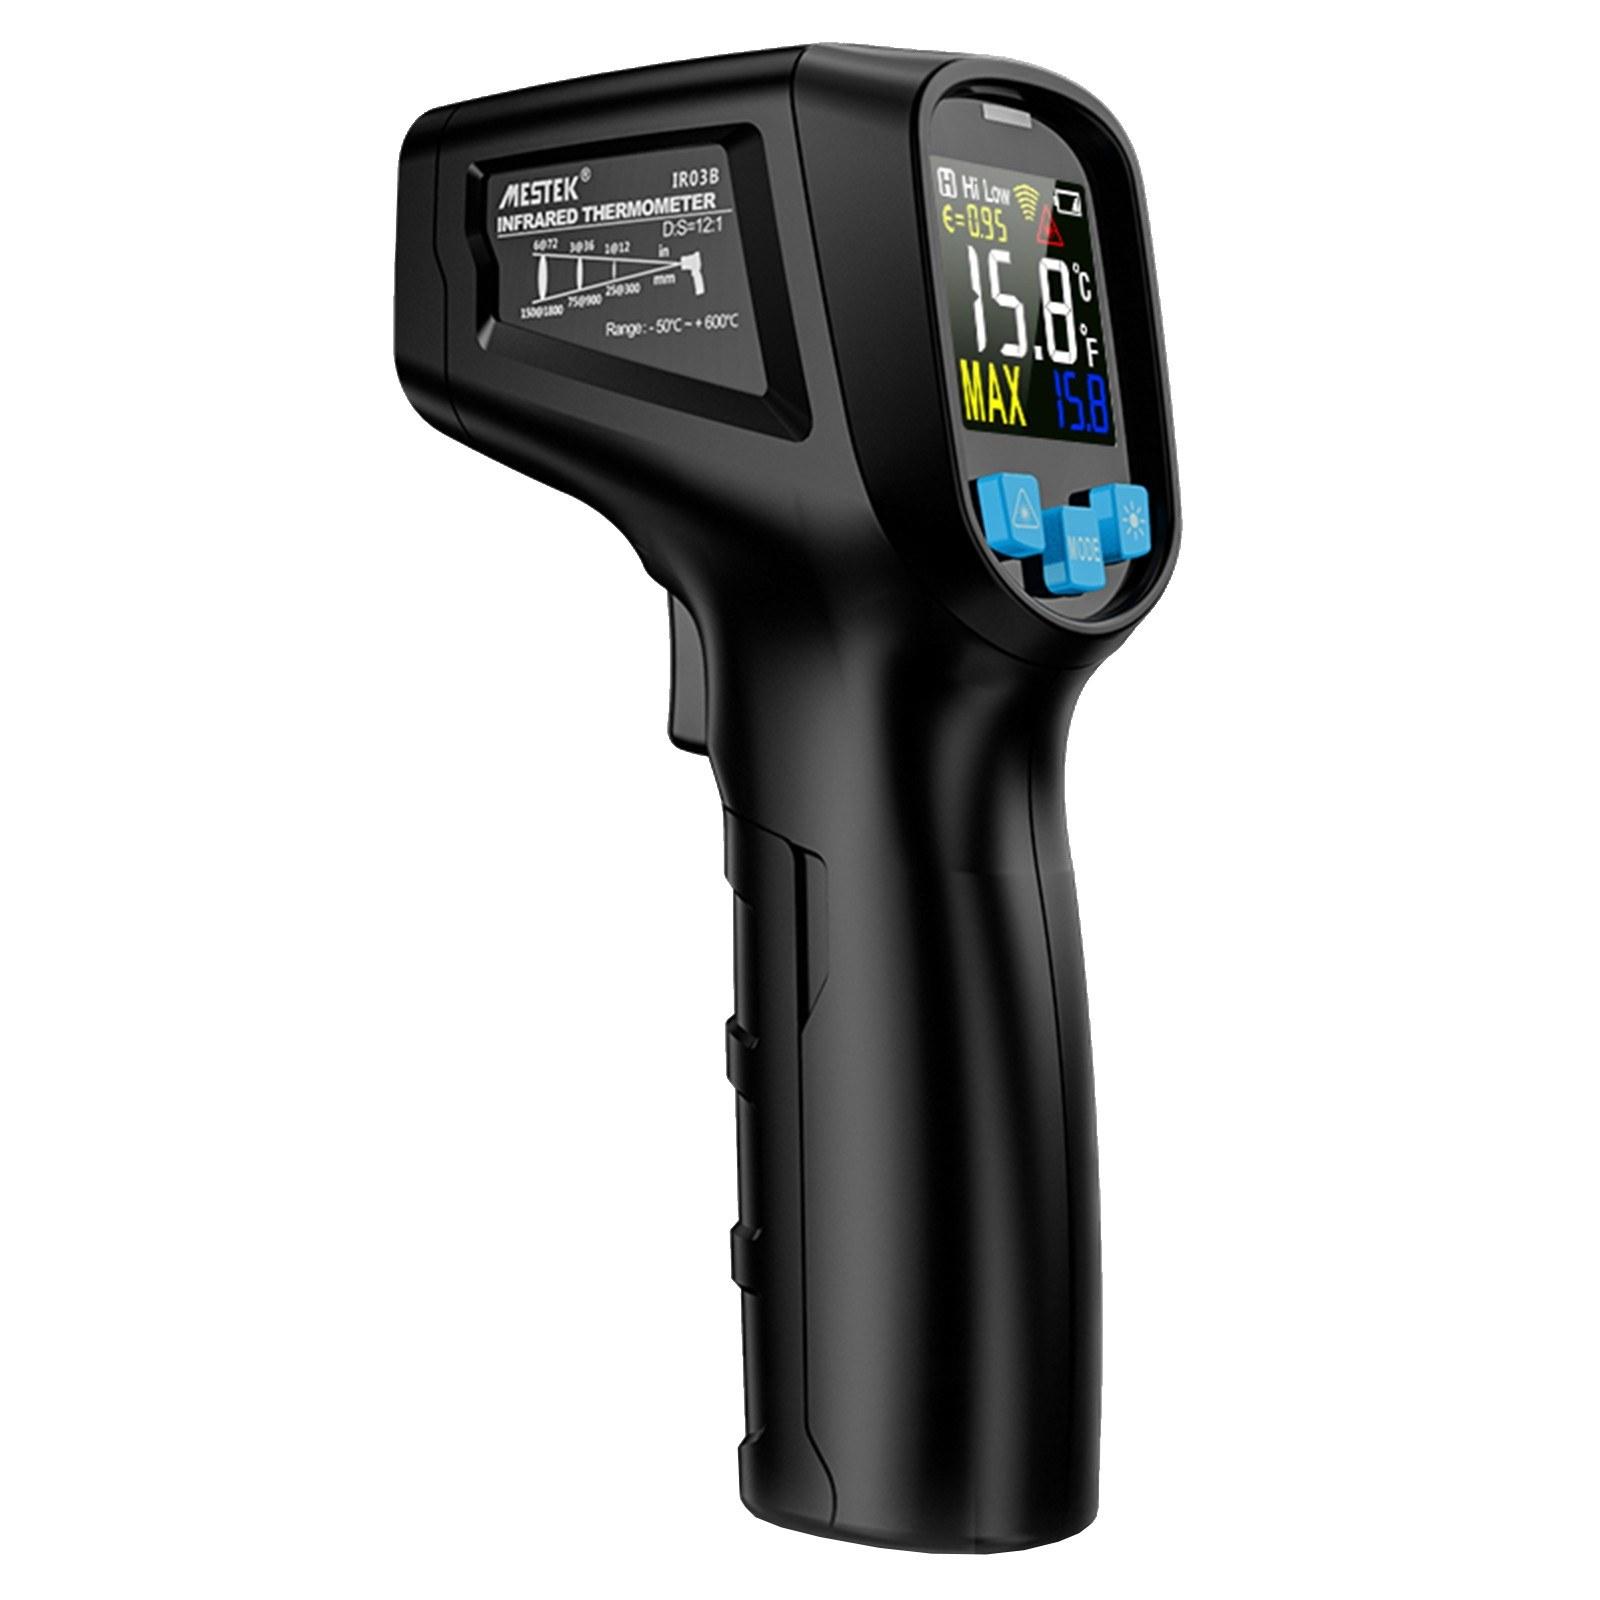 MESTEK -50~600u2103 Handheld Non-contact Digital LCD Infrared Thermometer Industrial IR Temperature Tester Pyrometer Adjustable Emissivity